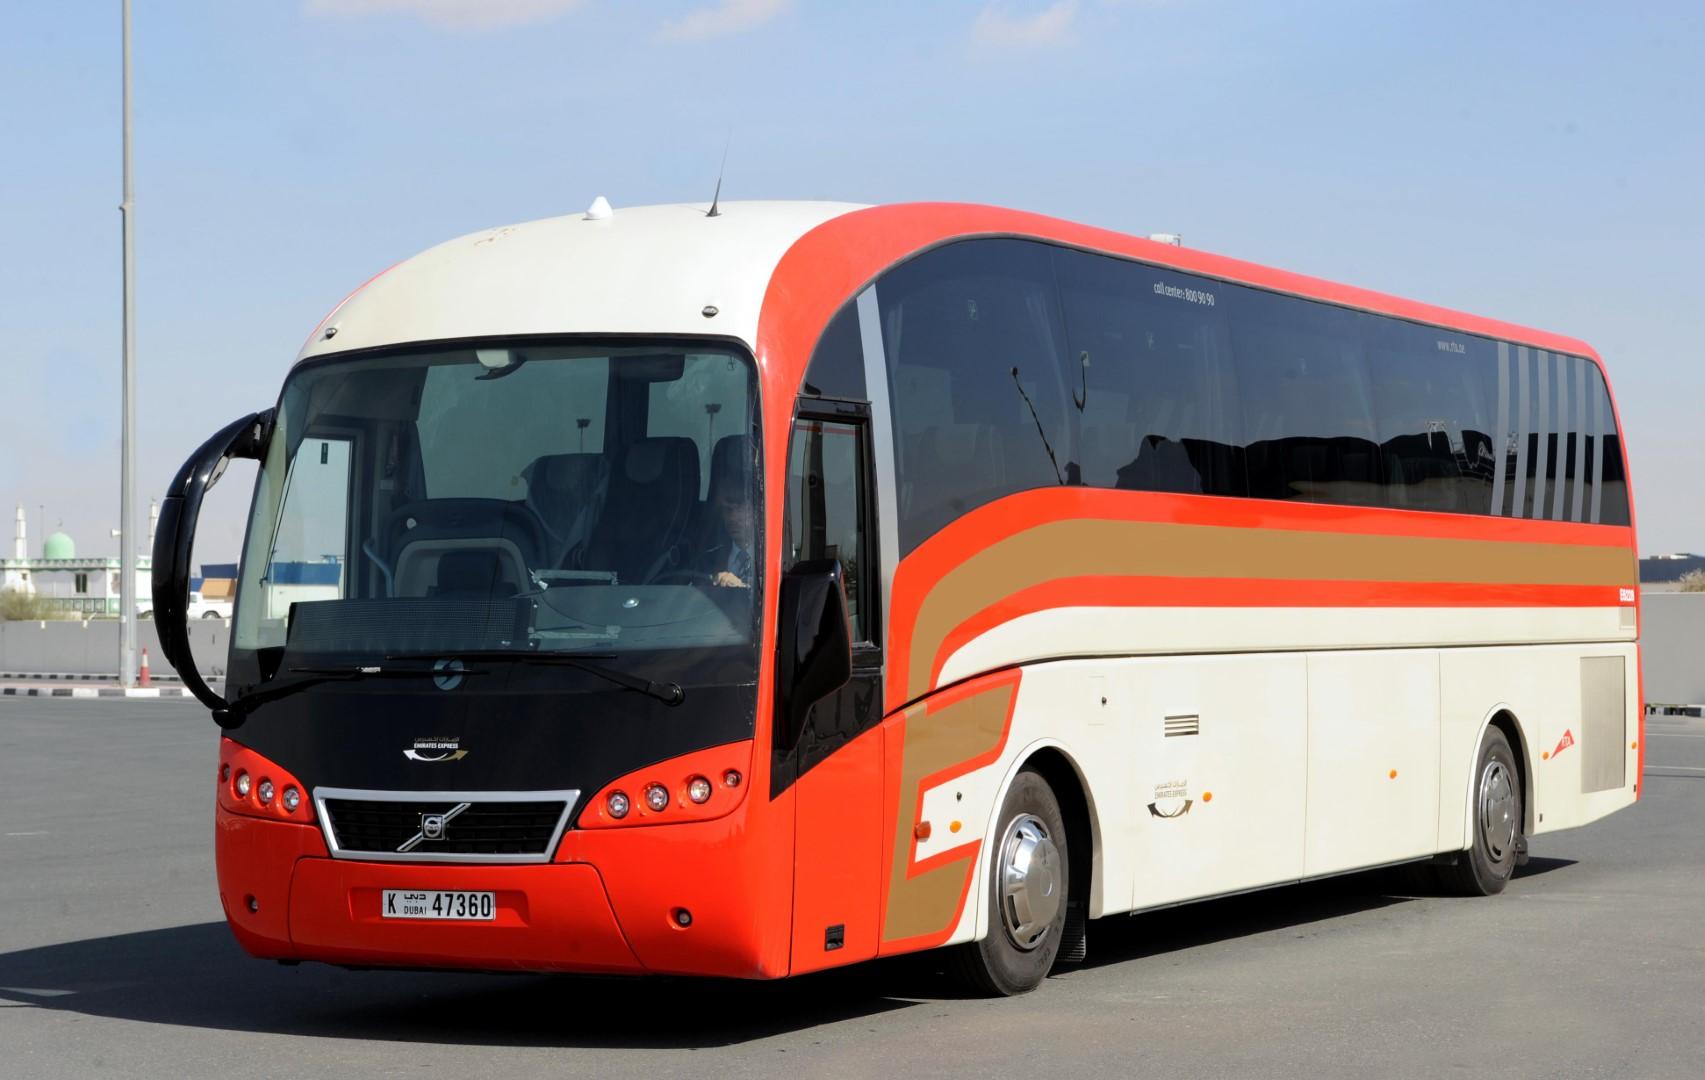 Dua jalur bus beroperasi antara Dubai dan Sharjah pada 27 Desember